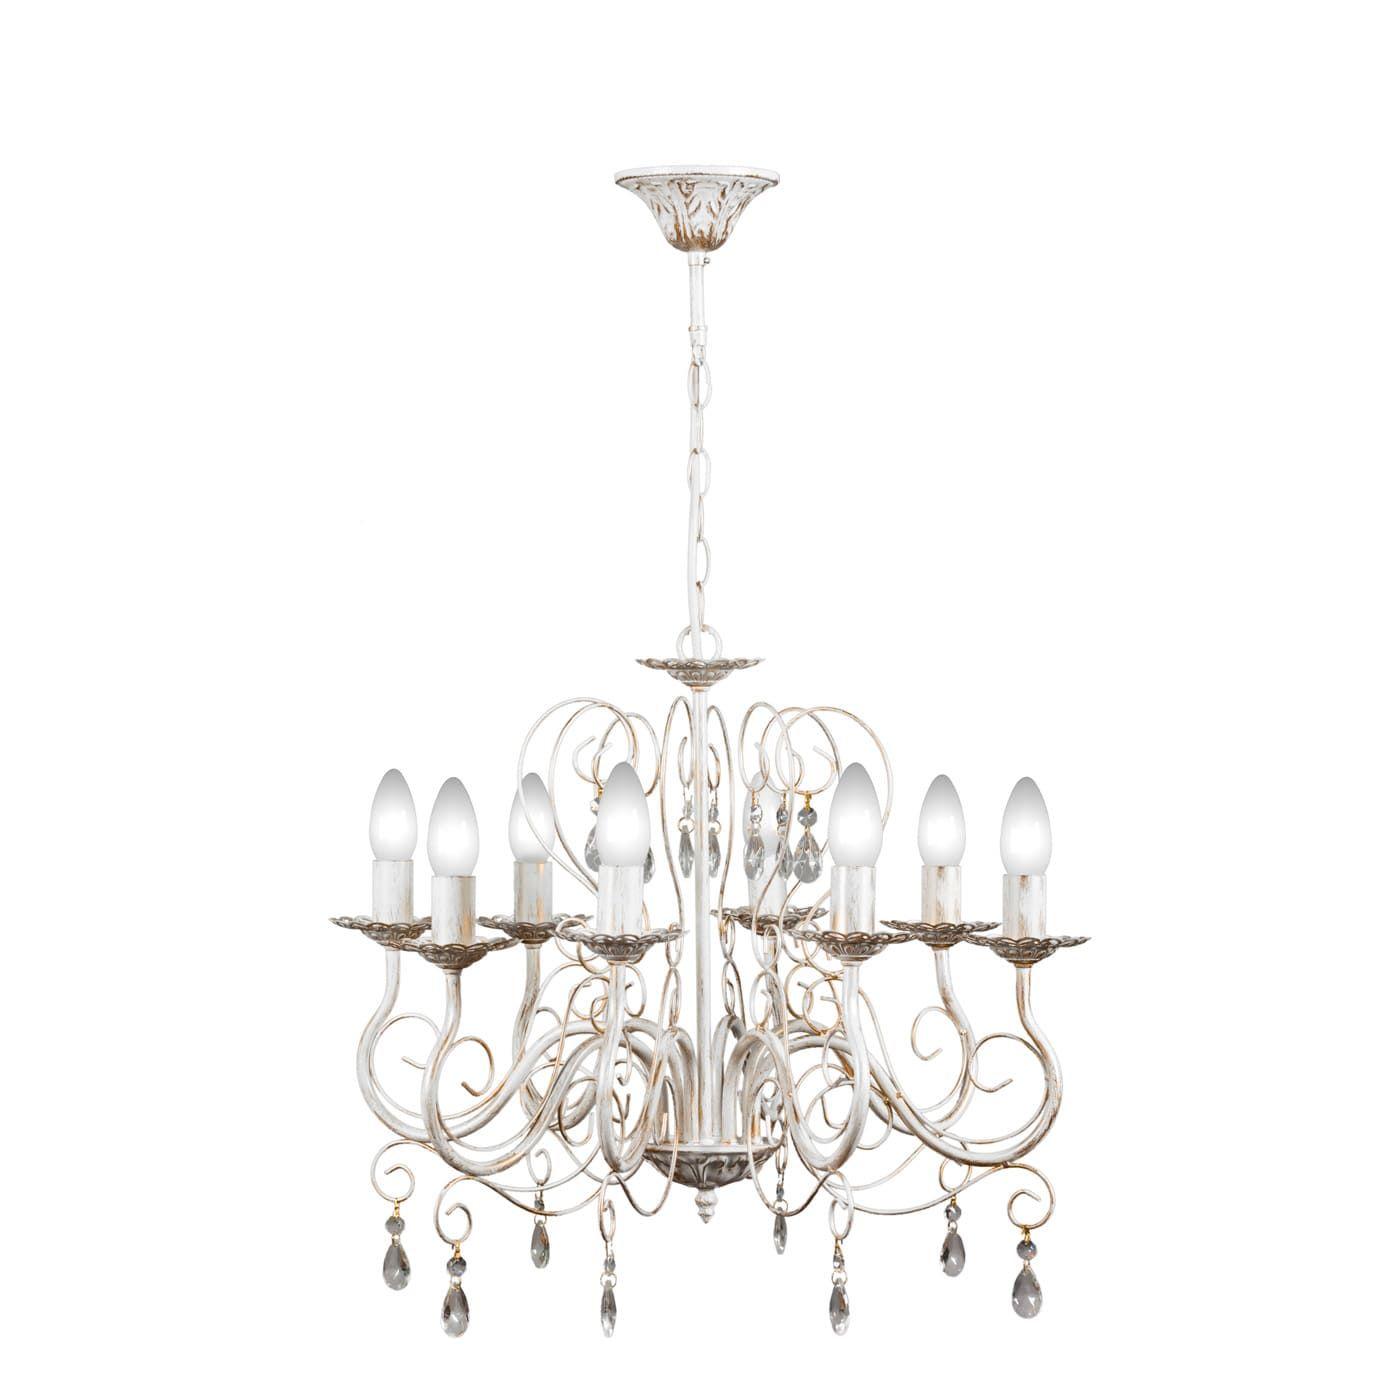 PETRASVET / Pendant chandelier S1021-8, 8xE14 max. 60W